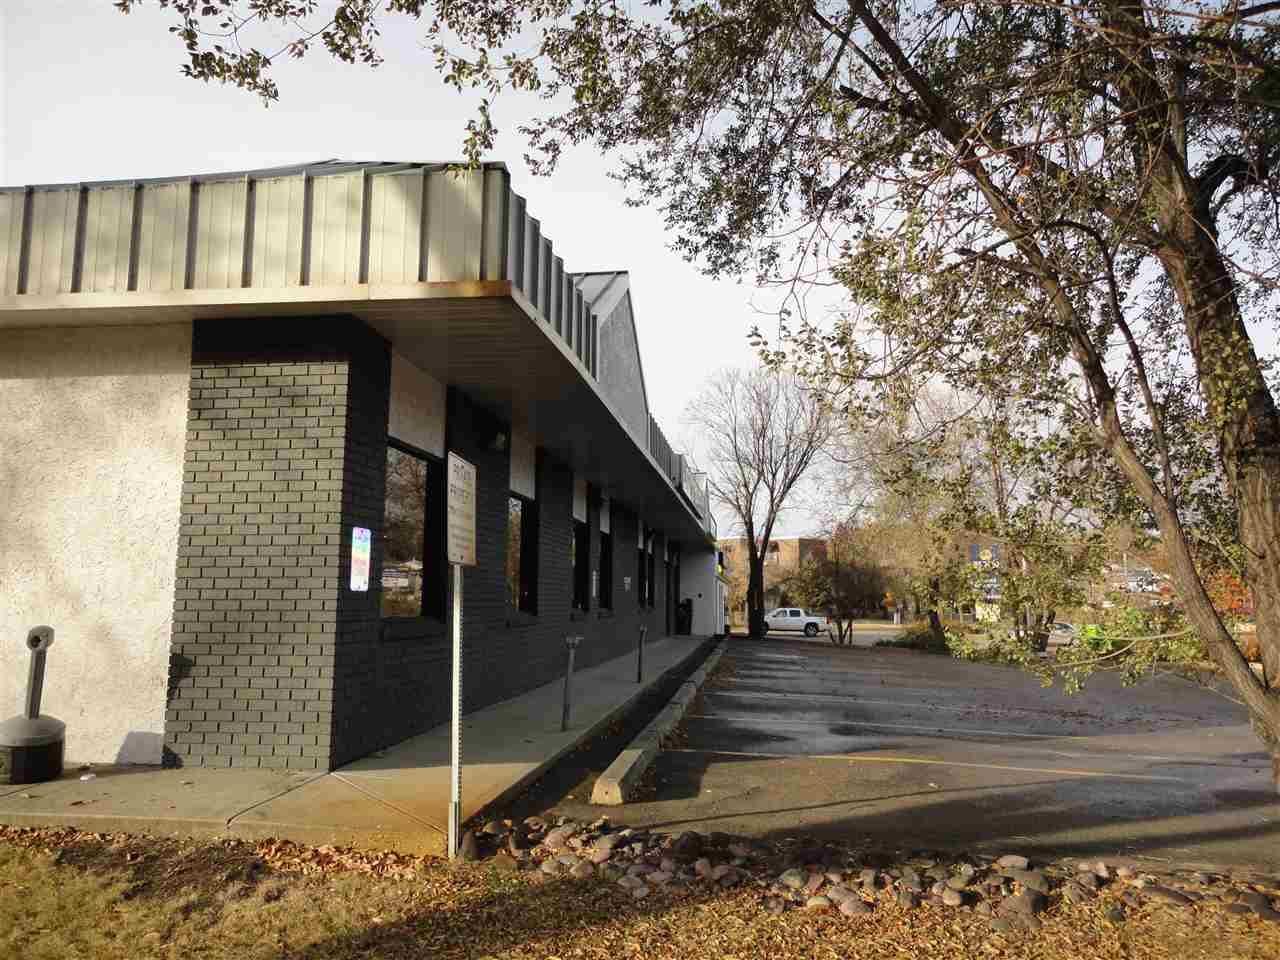 Main Photo: 7815 101 Avenue in Edmonton: Zone 19 Office for lease : MLS®# E4220115